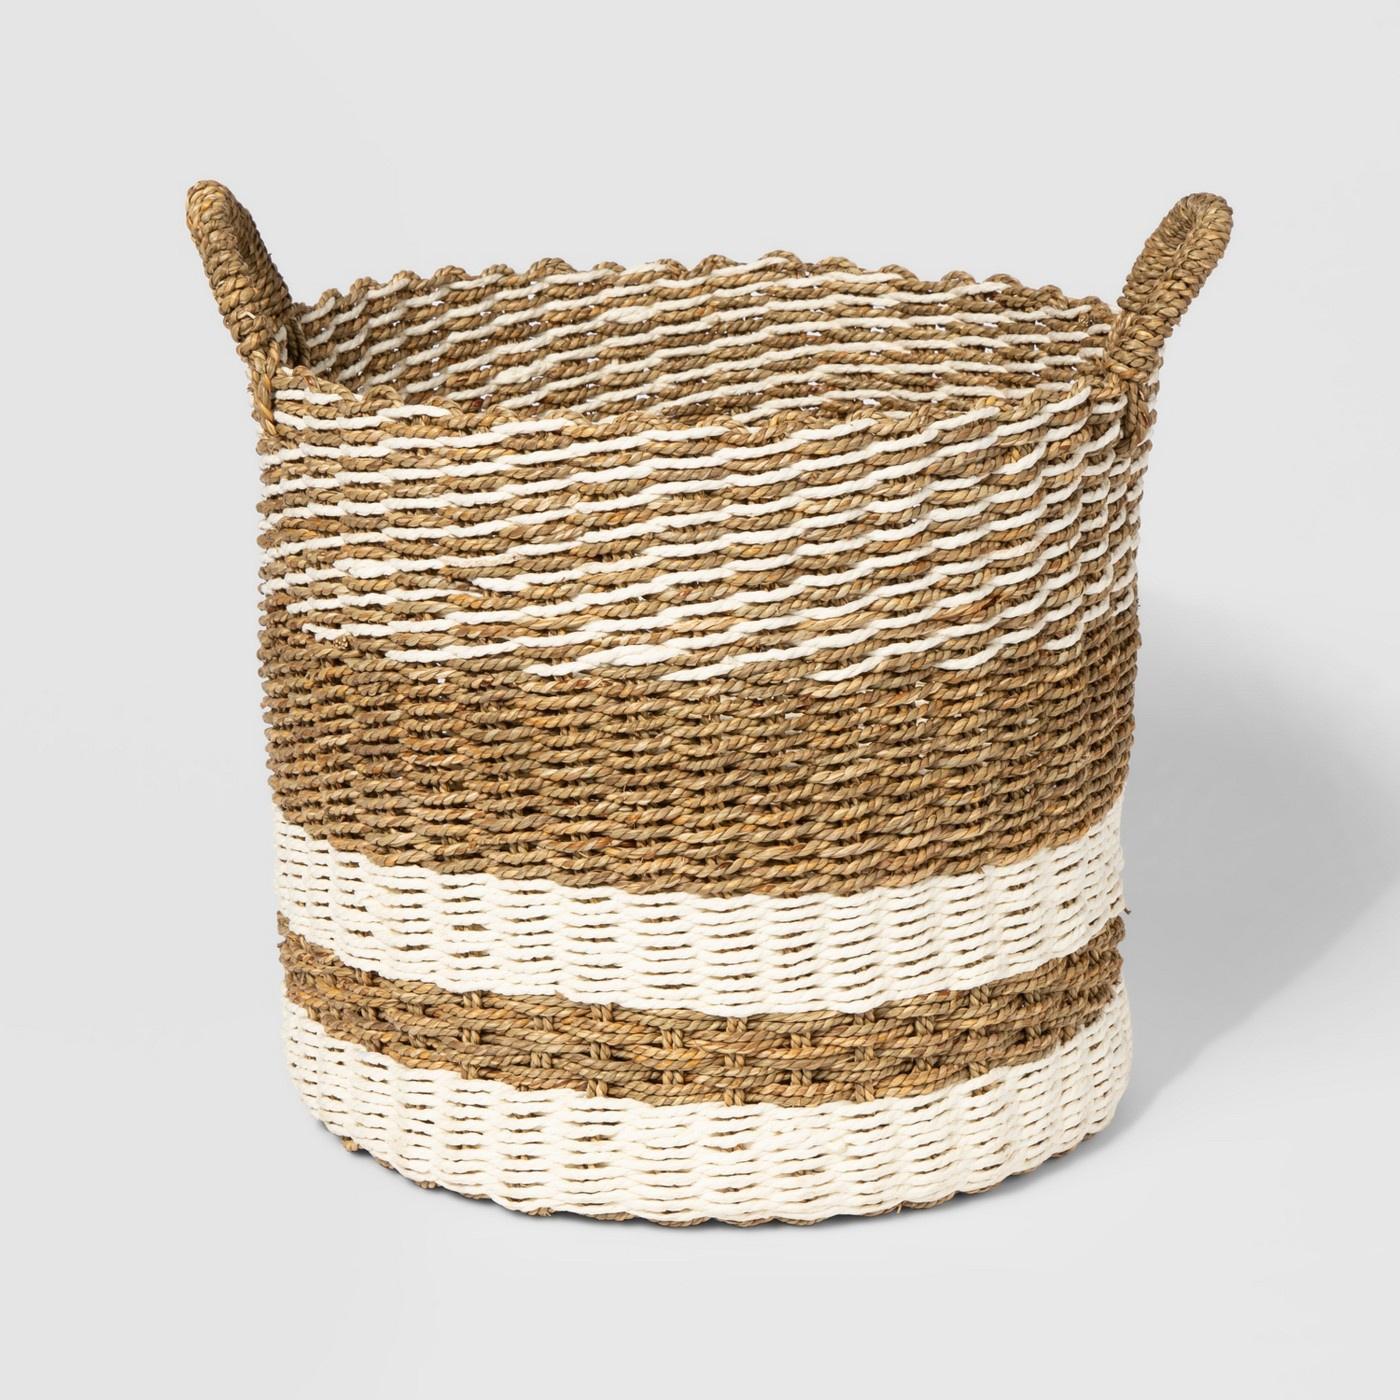 Striped Woven Basket.jpg